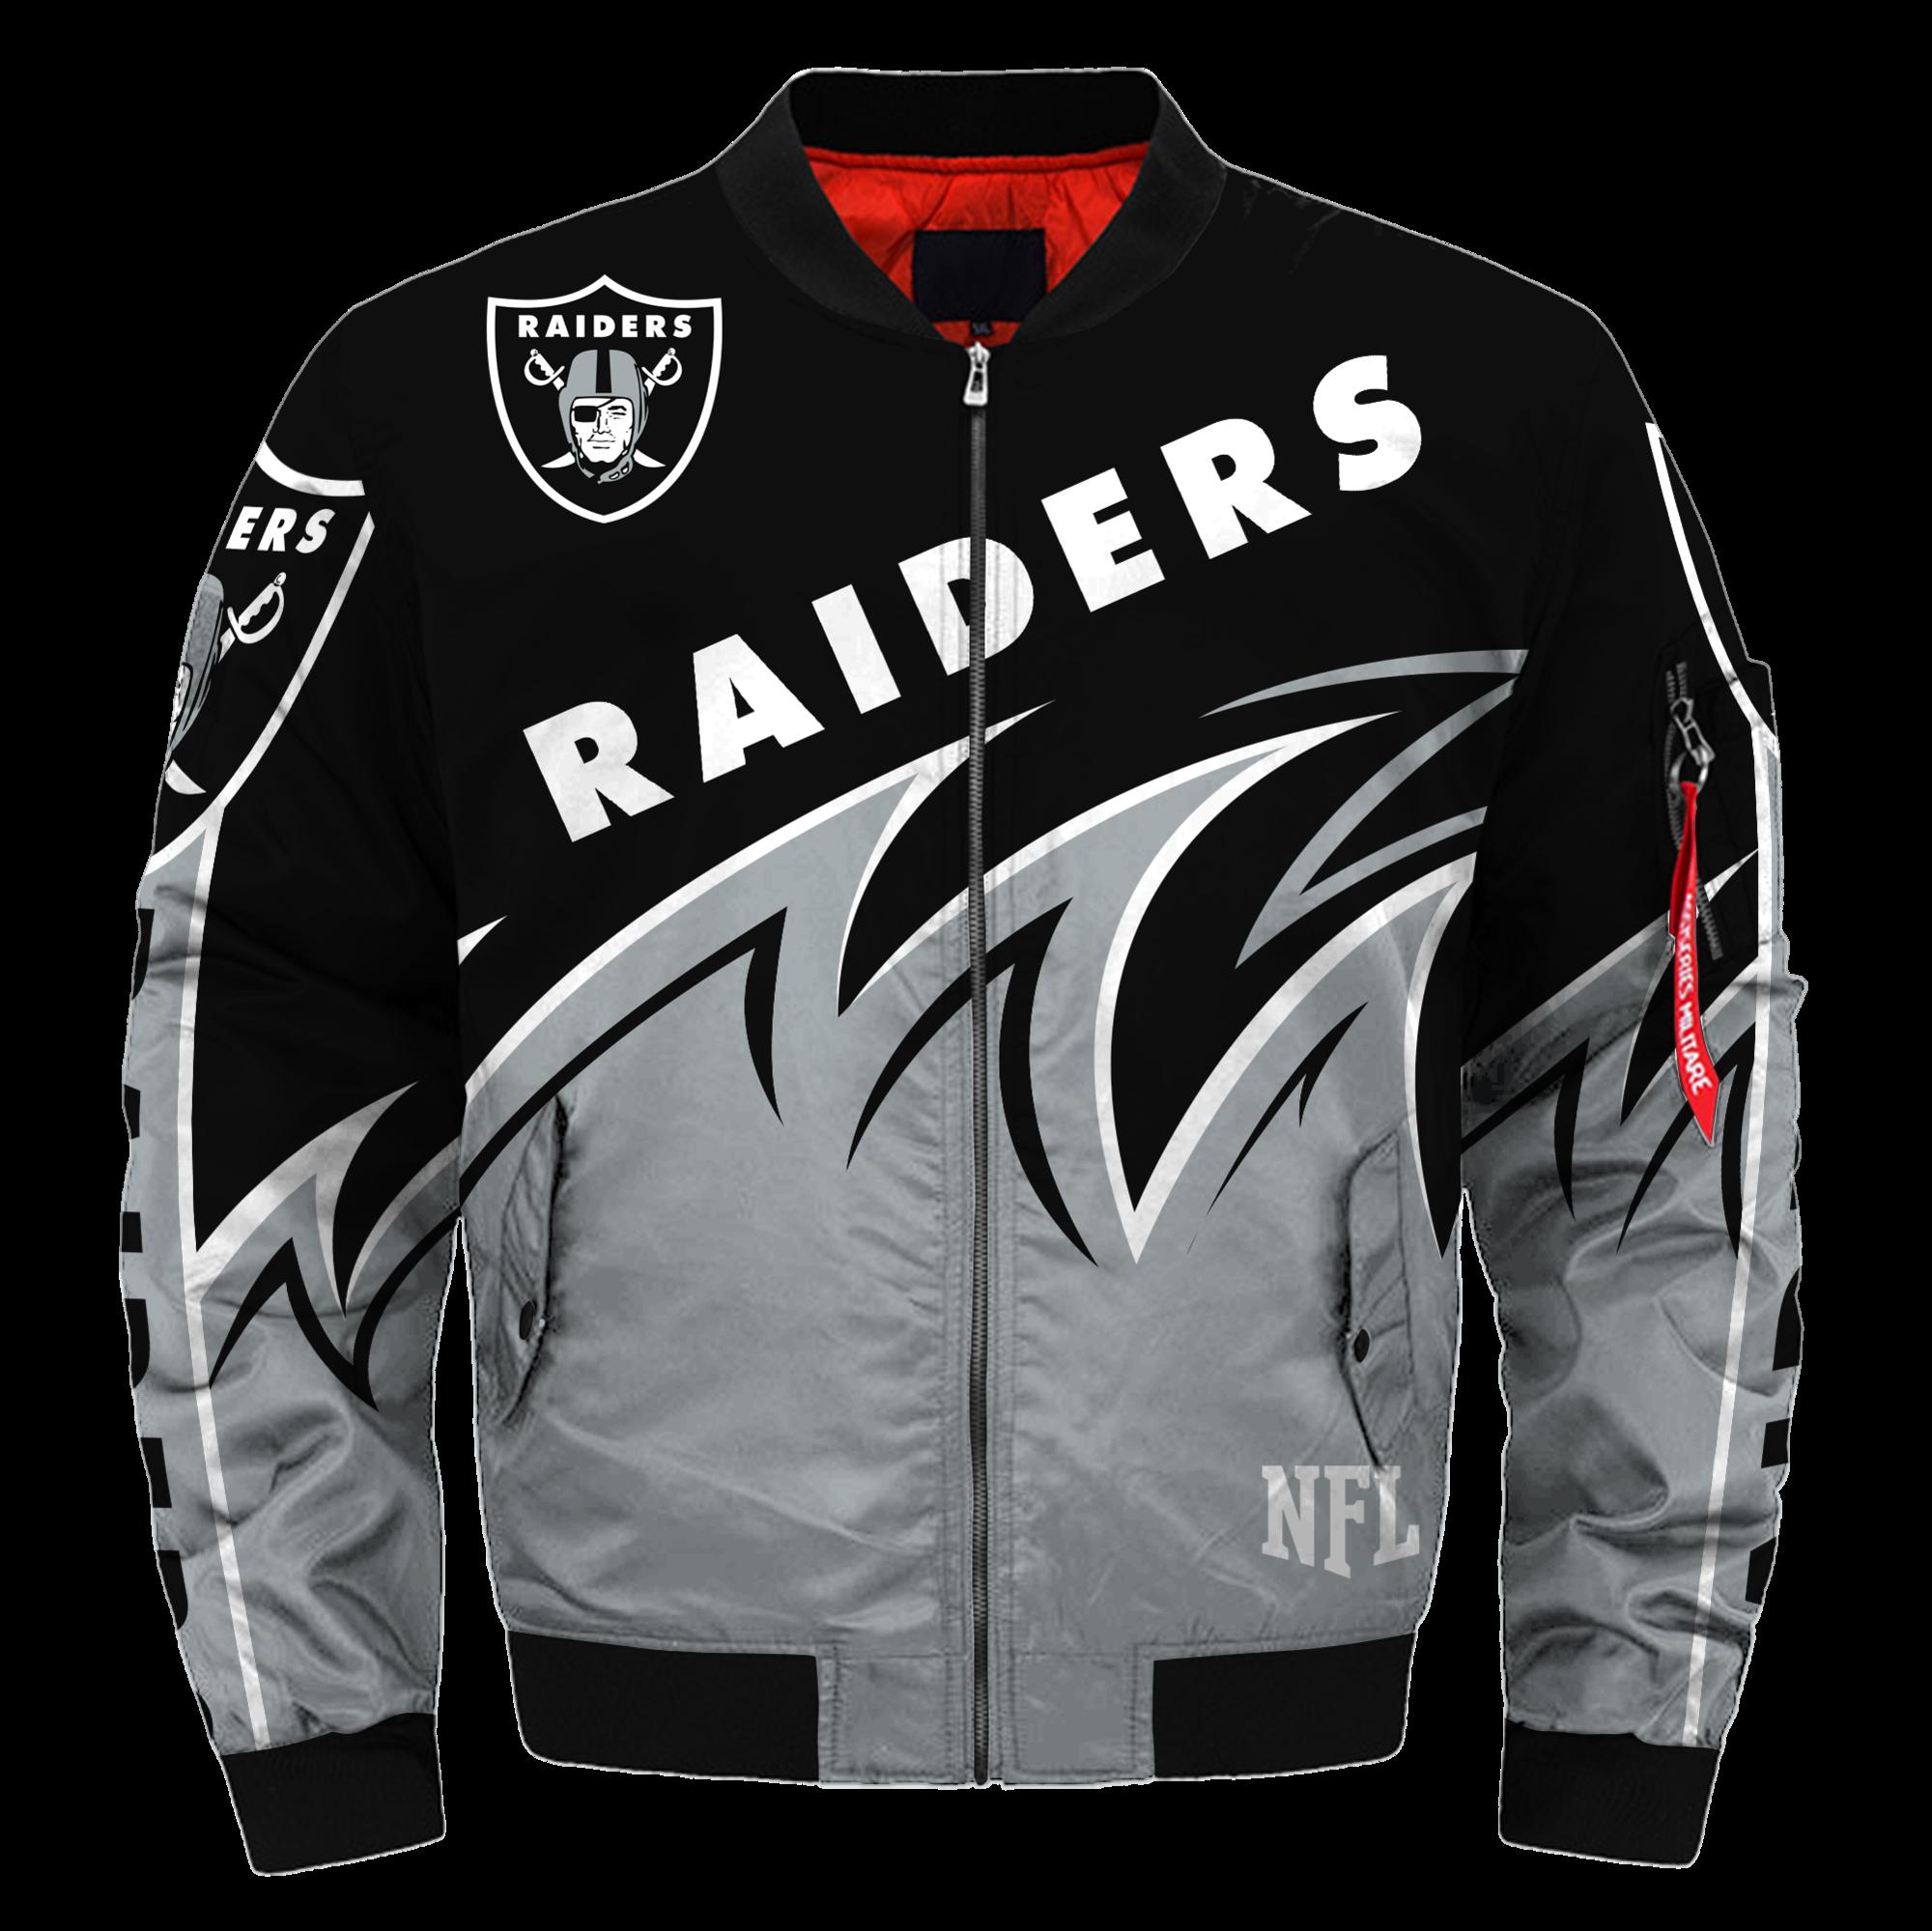 Oakland Raiders Bomber Jacket Nfl Oakland Raiders Apparel Nfl [ 1999 x 2000 Pixel ]